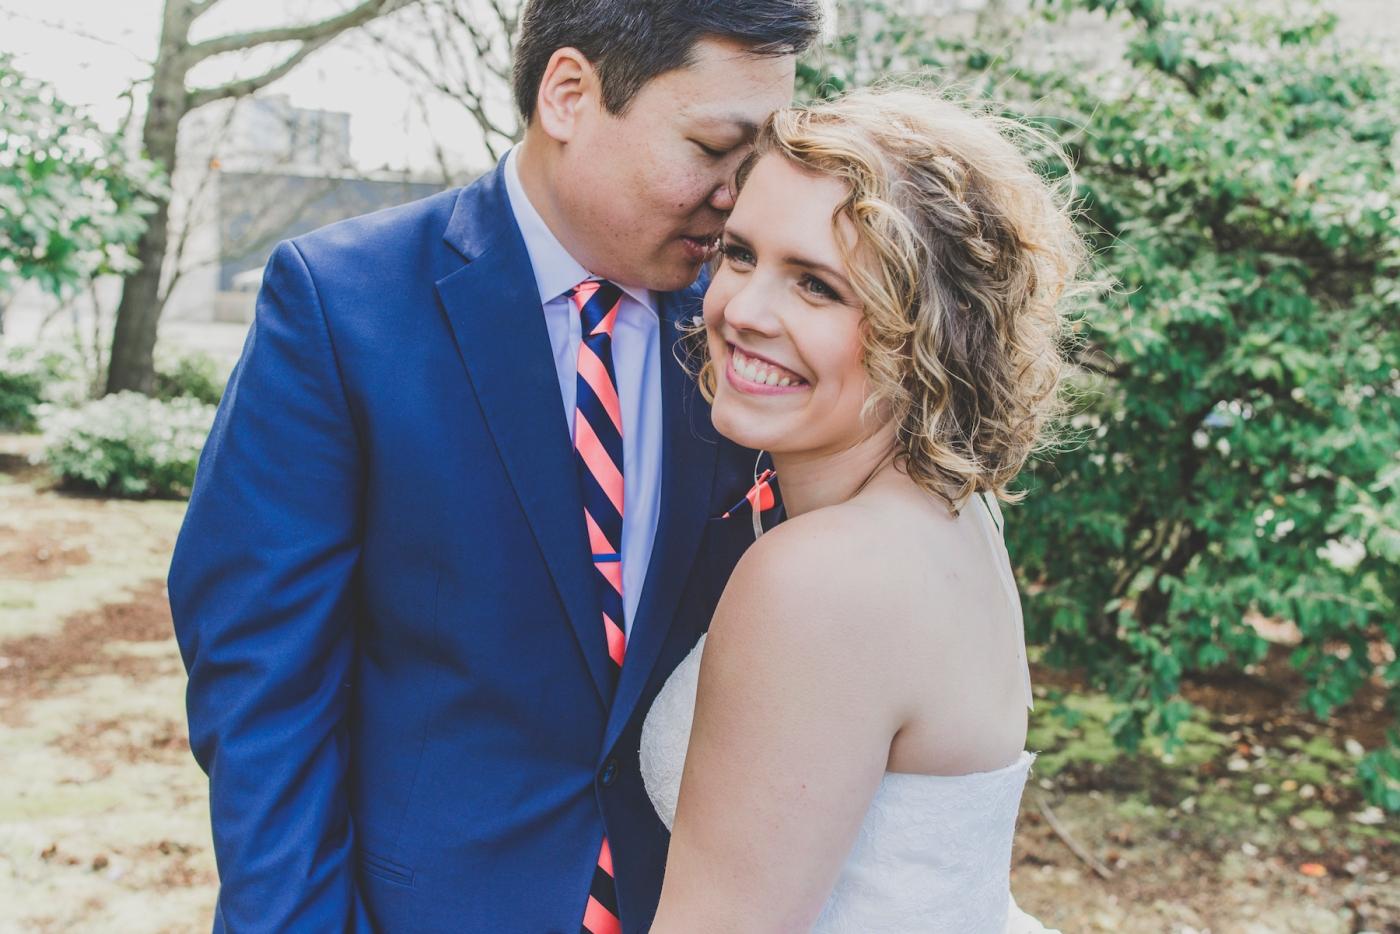 DSC_2331Everett_Wedding_Ballroom_Jane_Speleers_photography_Rachel_and_Edmund_Bridesmaids_peach_dresses_groomsmen_2017